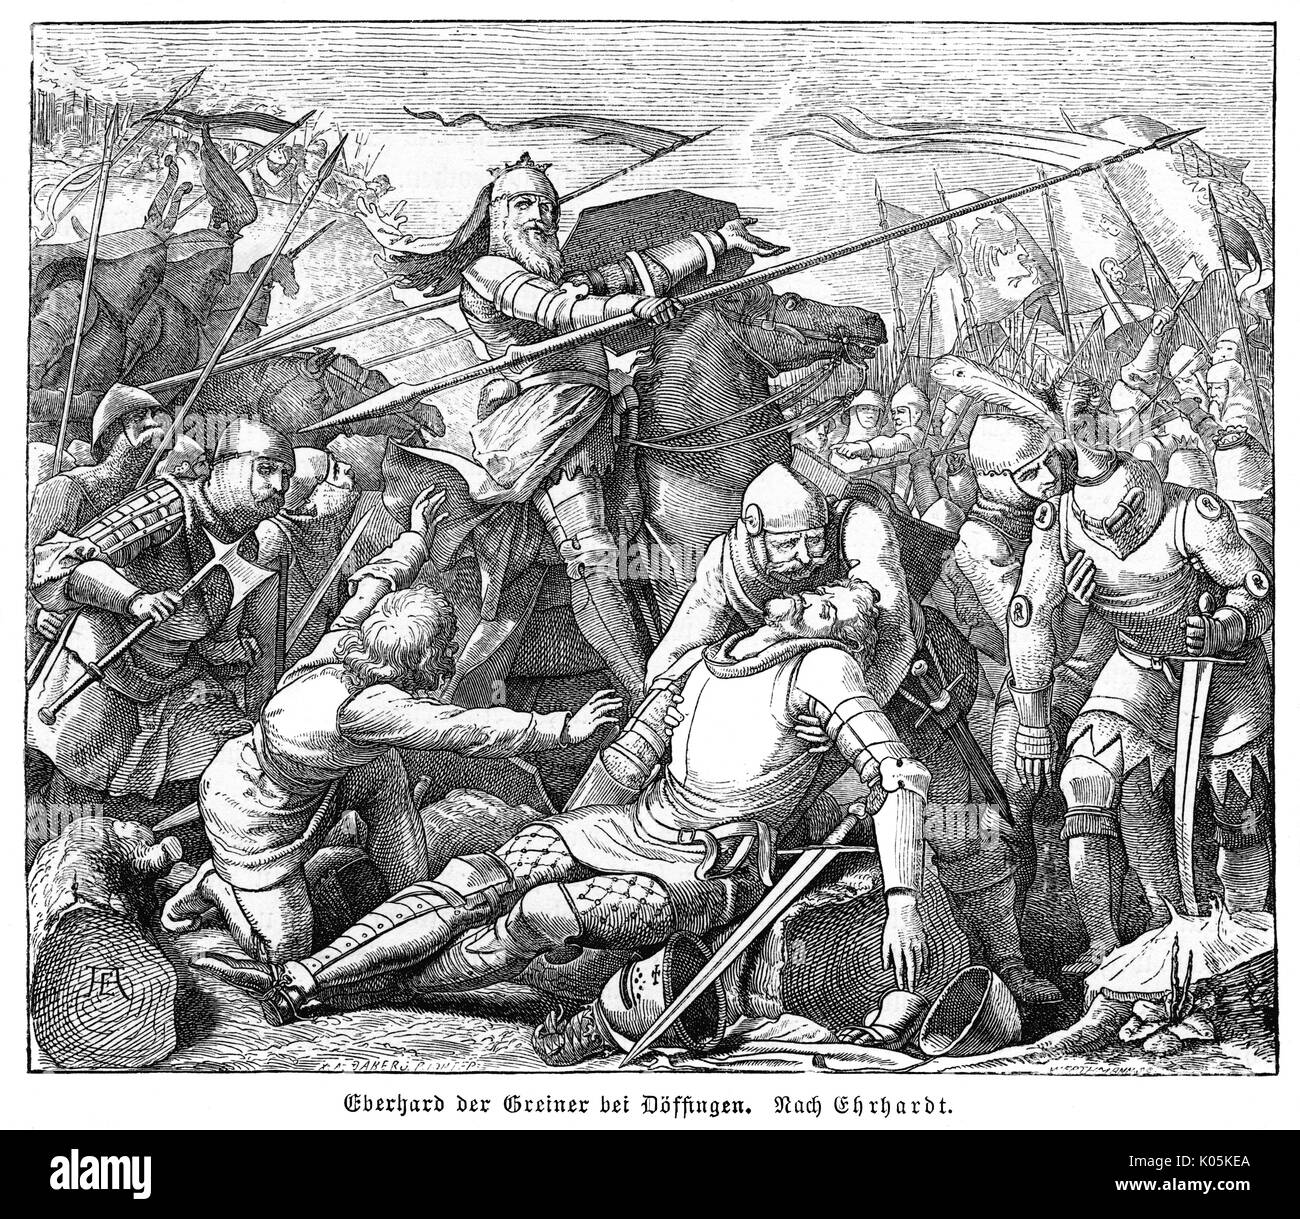 Eberhard II (der Greiner) at  Doeffingen         Date: 23rd August 1388 - Stock Image